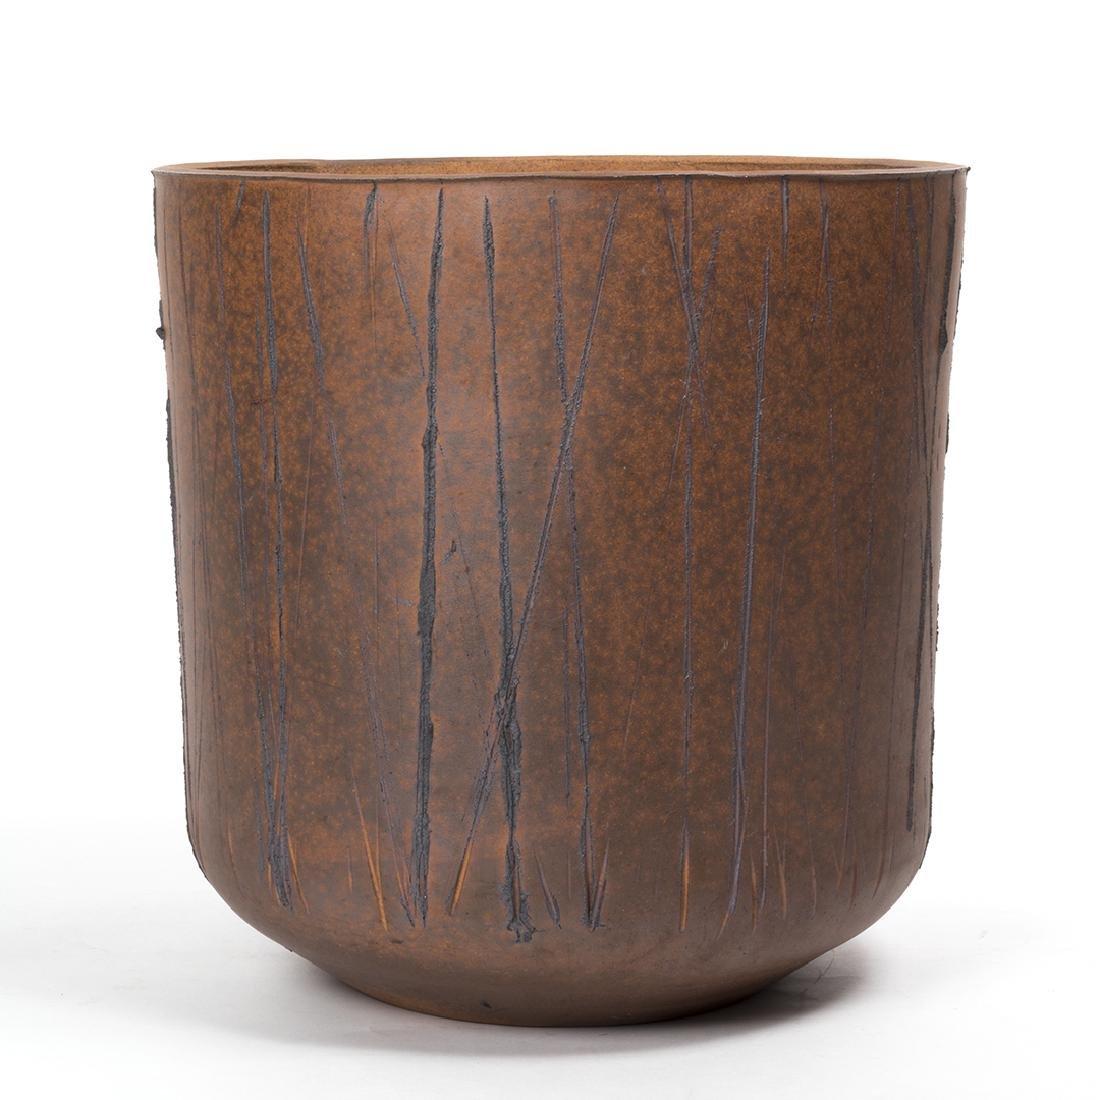 David Cressey Stoneware Planter - 3